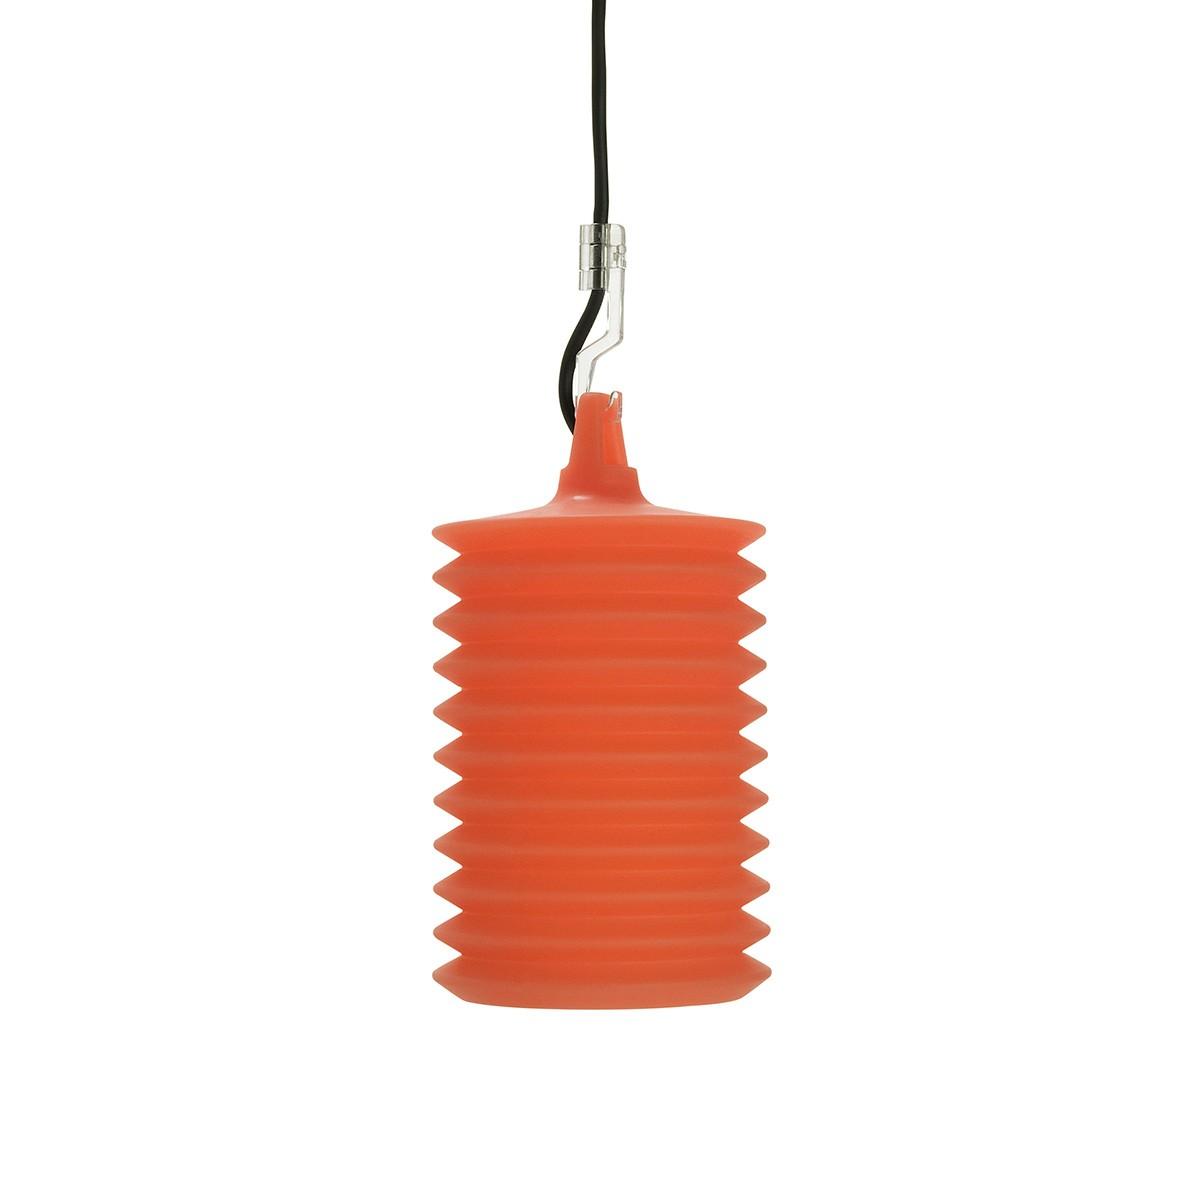 Rotaliana Lampion H2 Pendelleuchte, orange, ohne Stecker